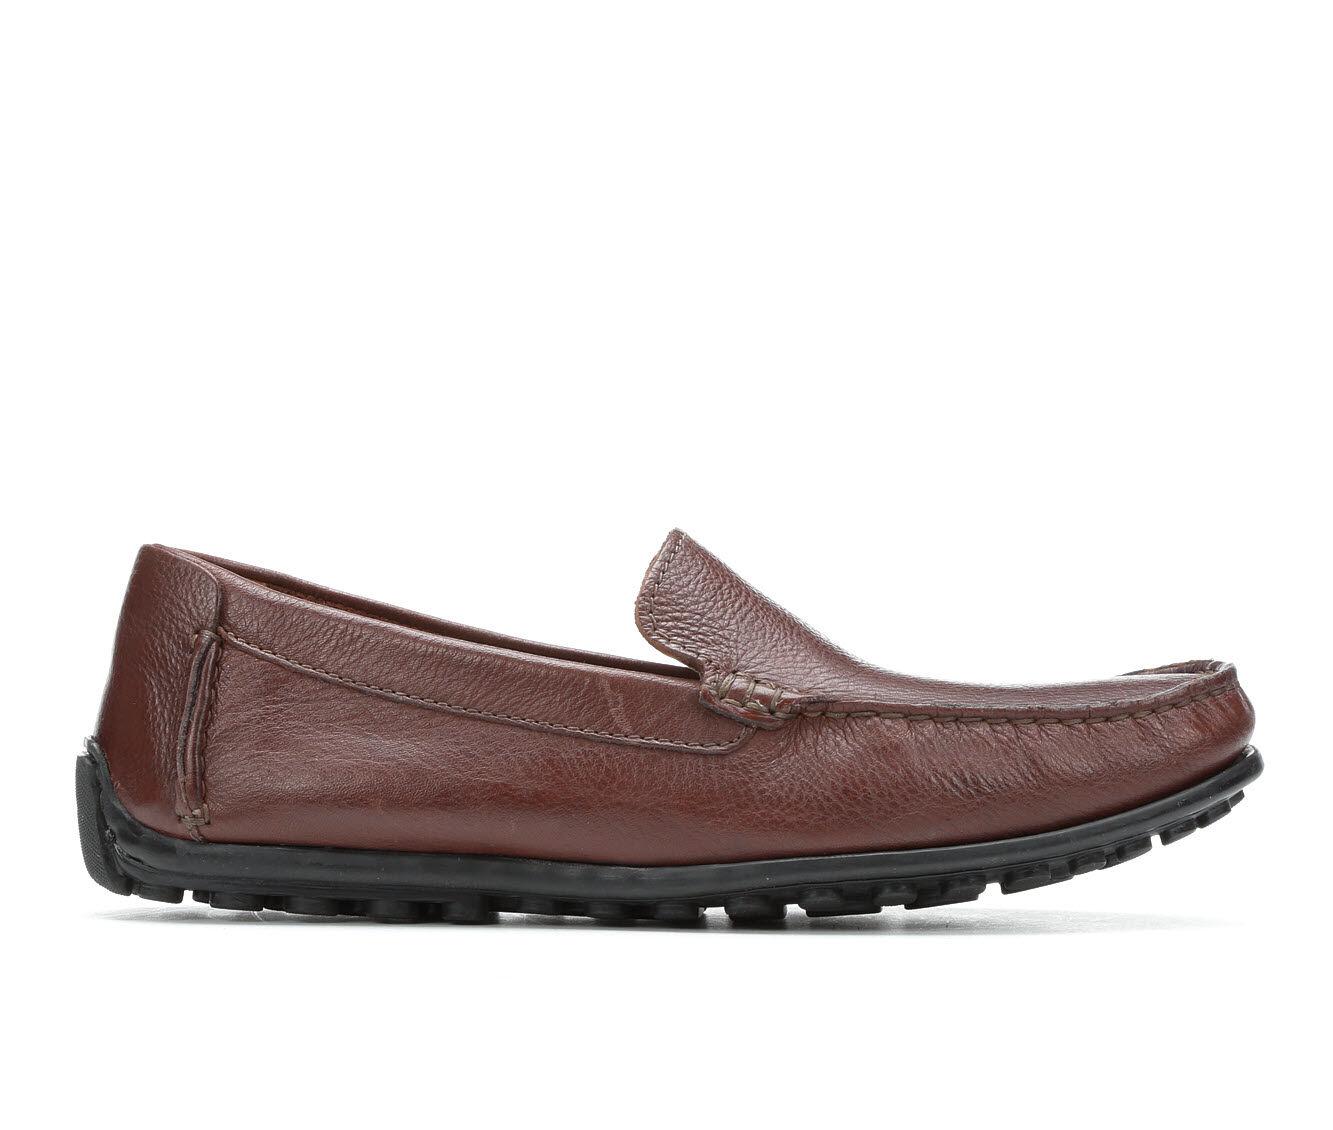 Men's Clarks Hamilton Free Loafers Cognac